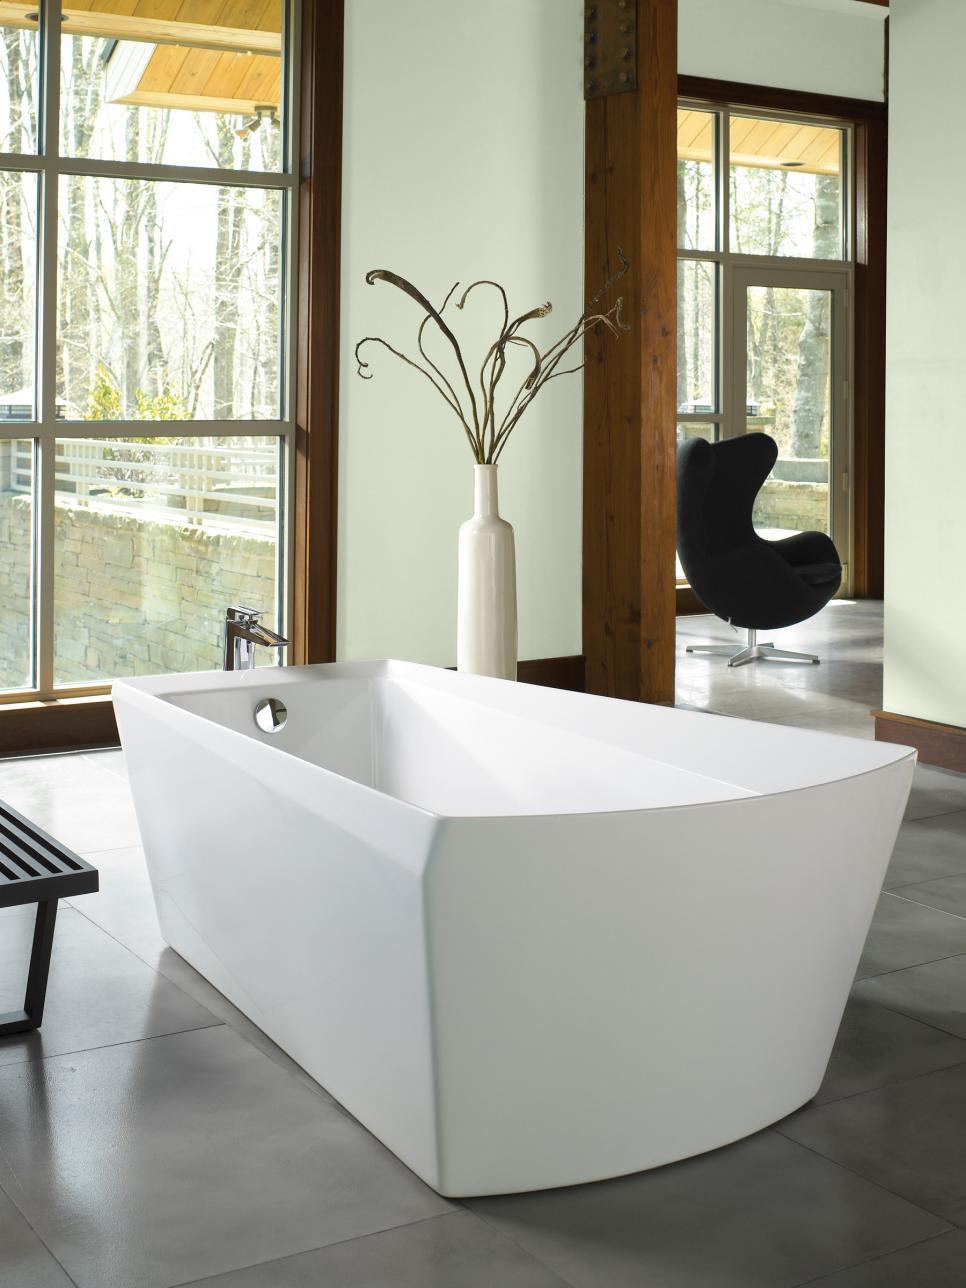 Bathtub Design Ideas | HGTV